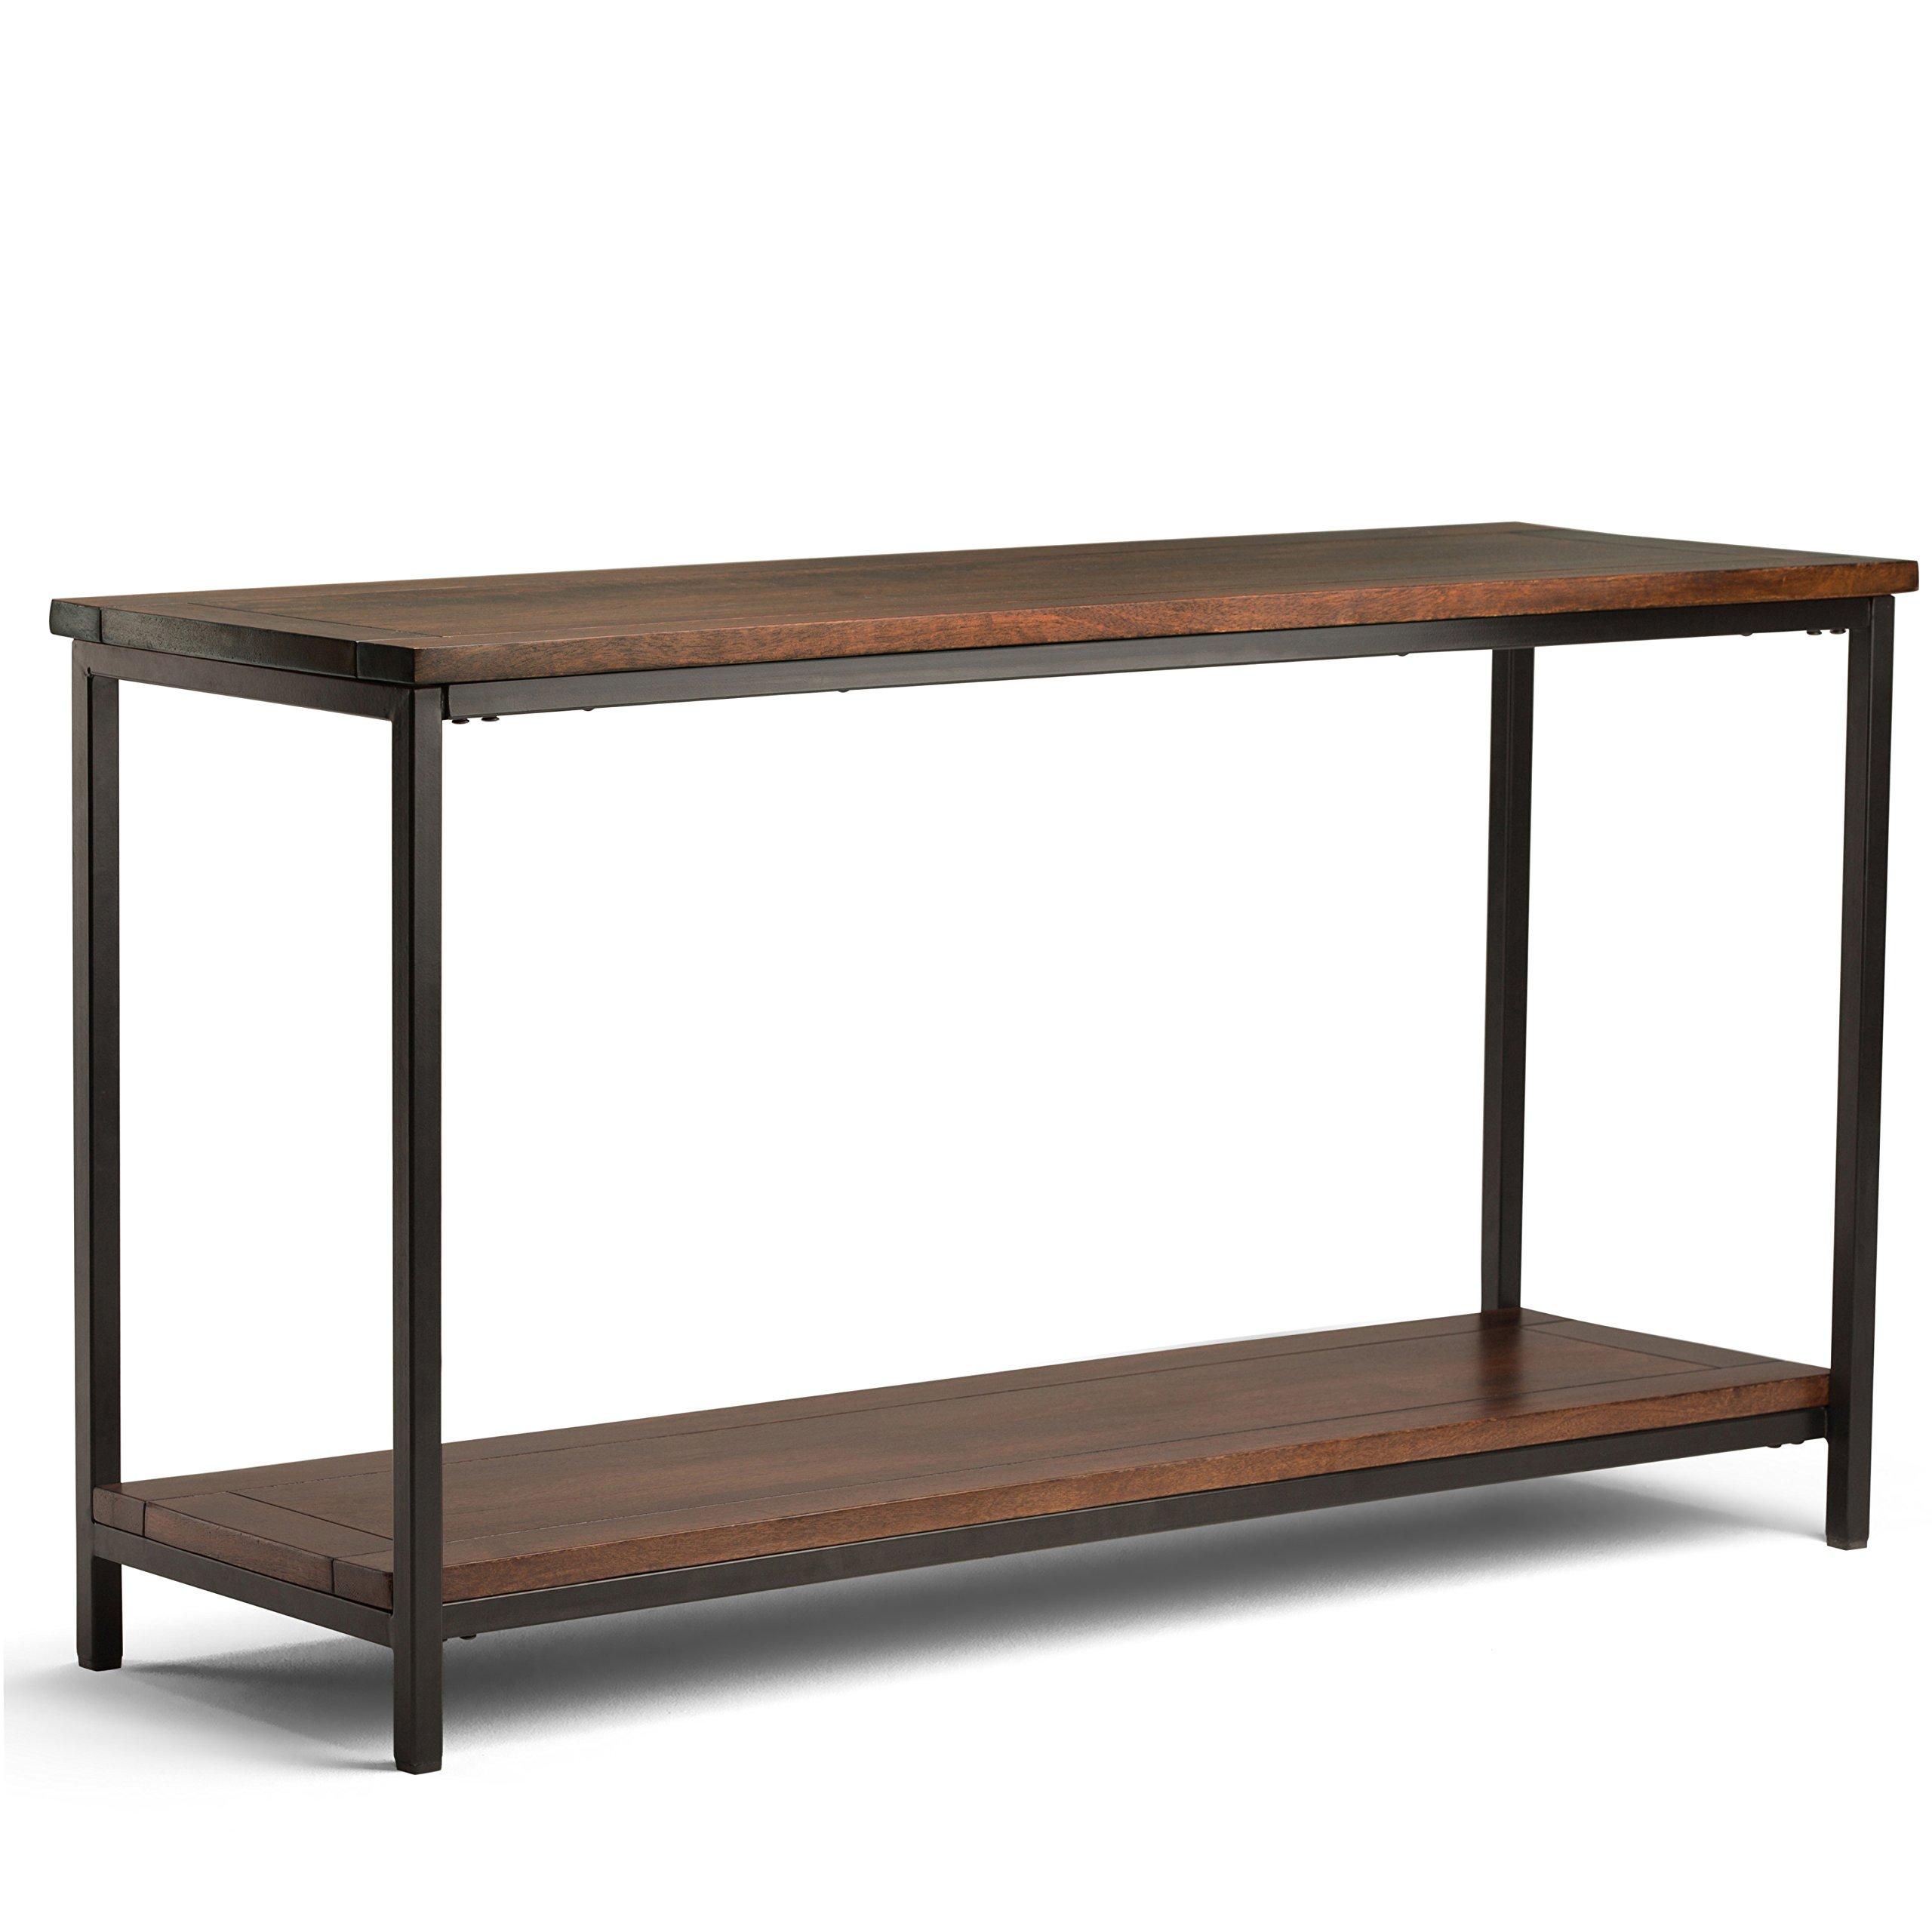 Simpli Home 3AXCSKY-04 Skyler Solid Mango Wood and Metal 54 inch Wide Modern Industrial Console Sofa Table in Dark Cognac Brown by Simpli Home